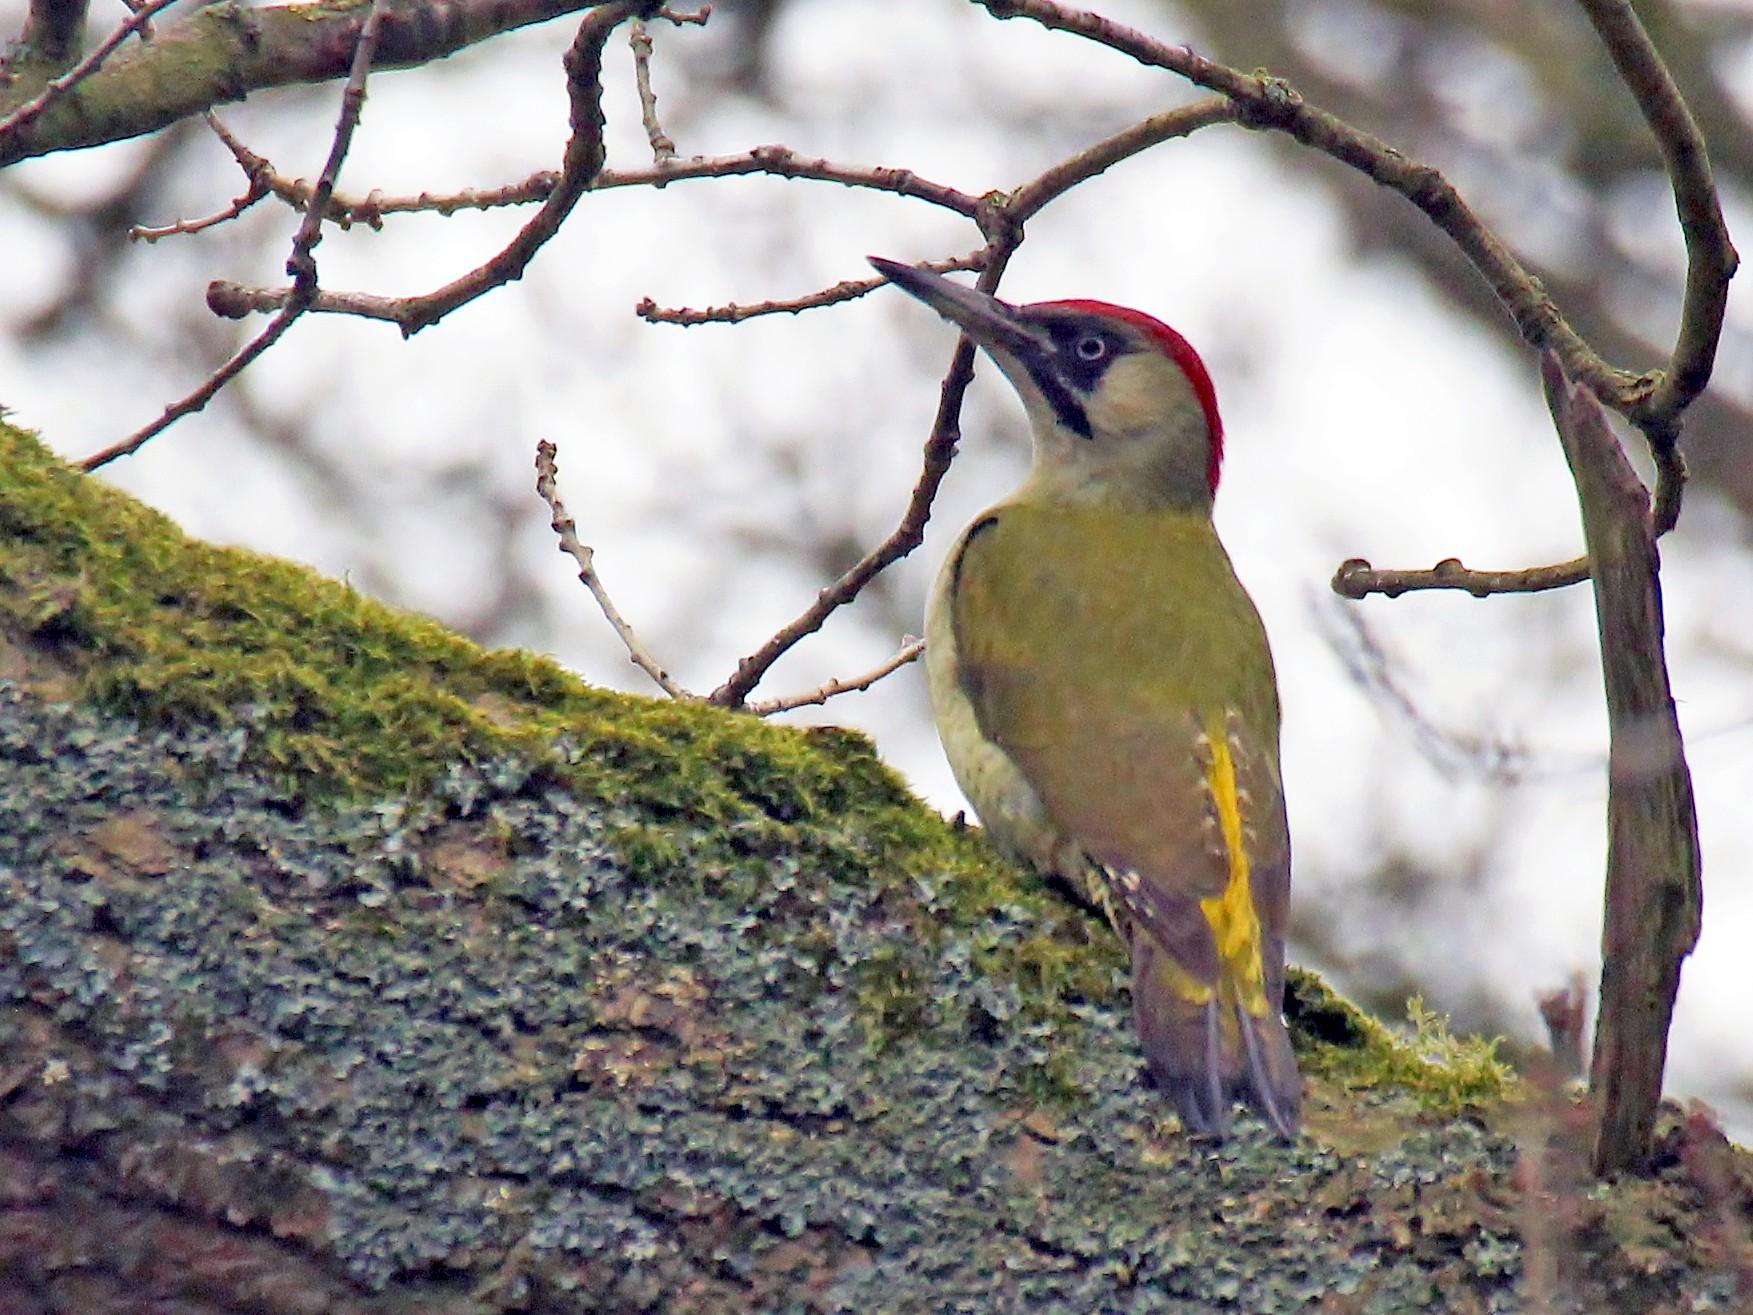 Eurasian/Iberian Green Woodpecker - Stratton Hatfield